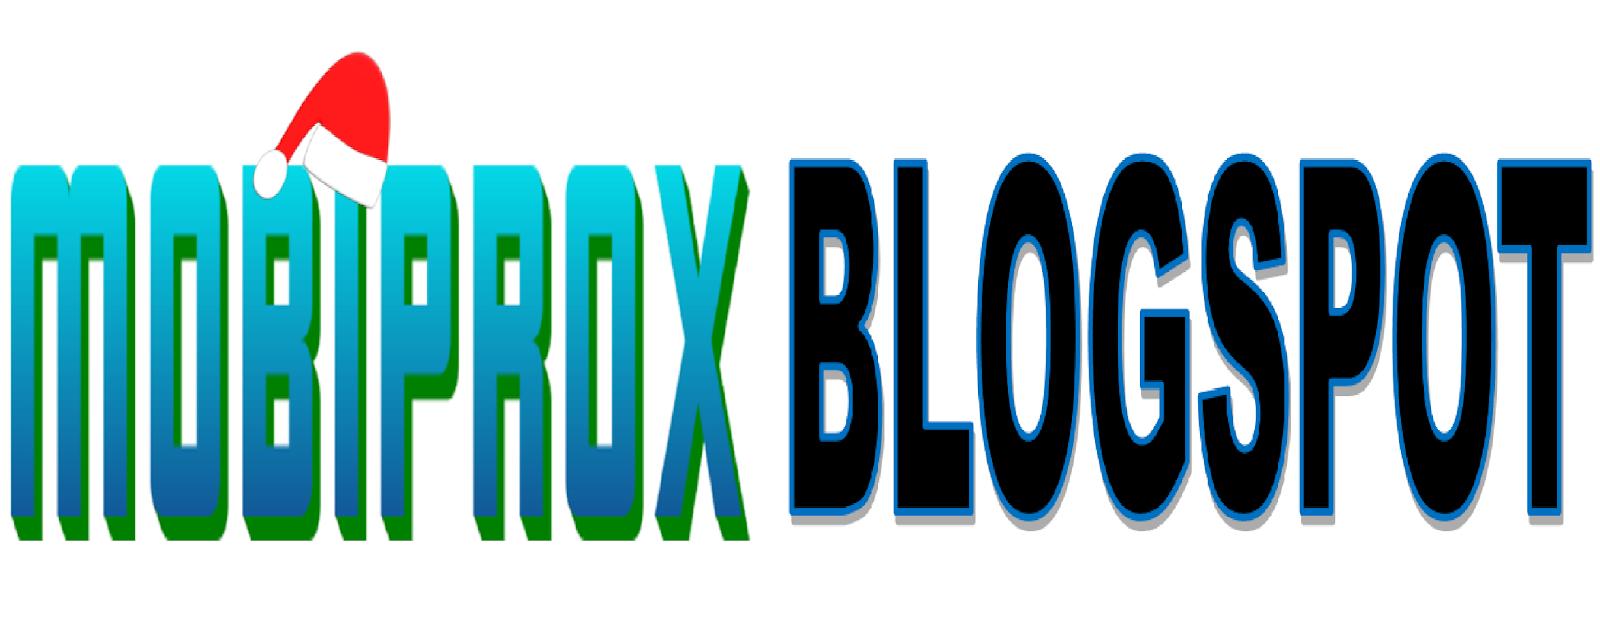 TECNO CAMON C7 STOCK FIRMWARE - MOBIPROX ROMS